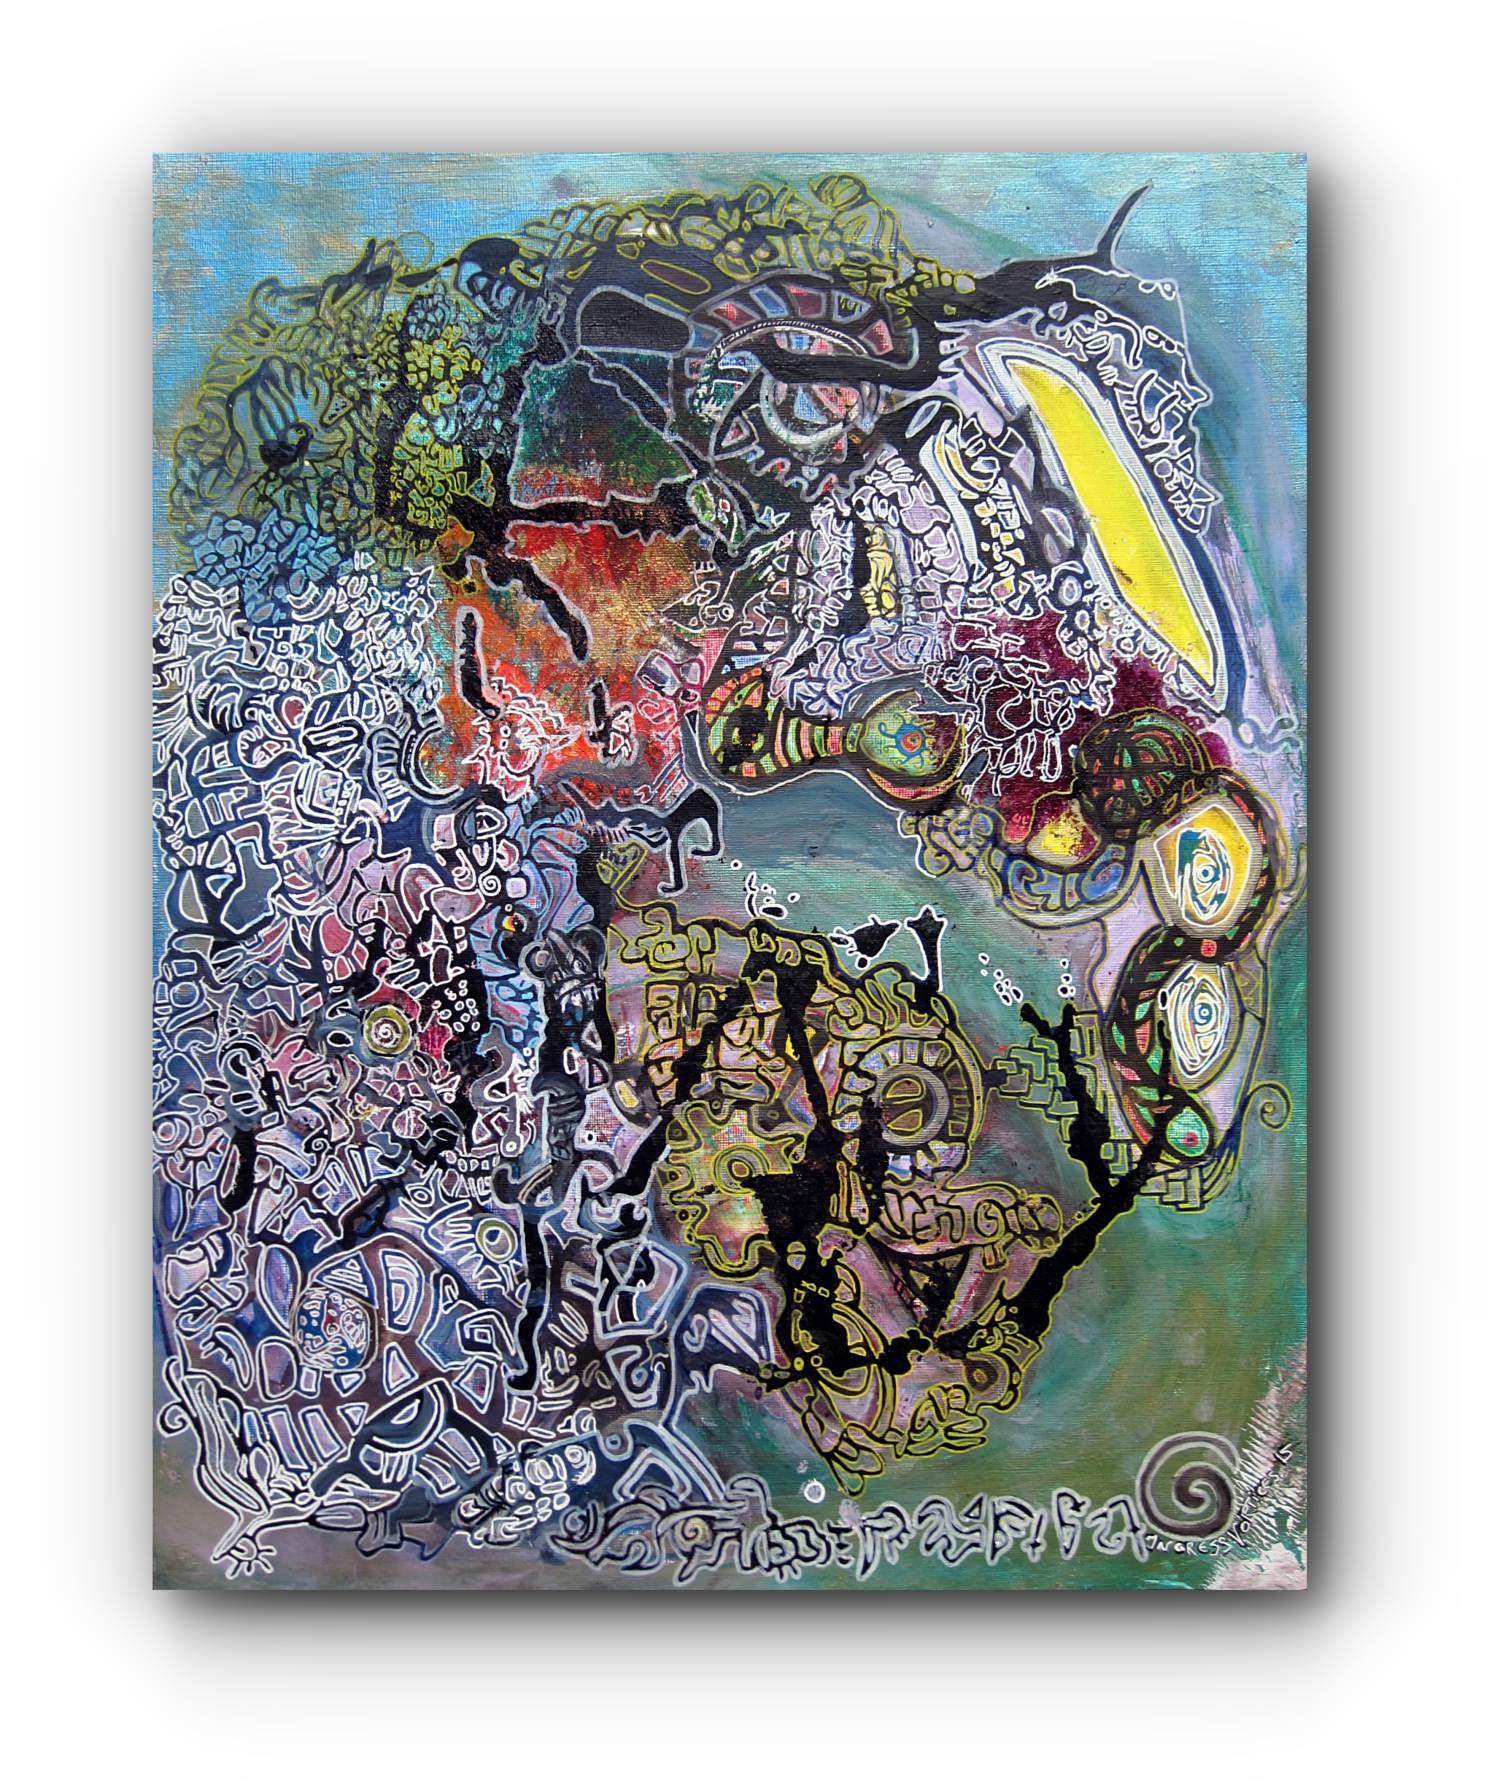 painting-mind-nature-artist-duo-ingress-vortices.jpg